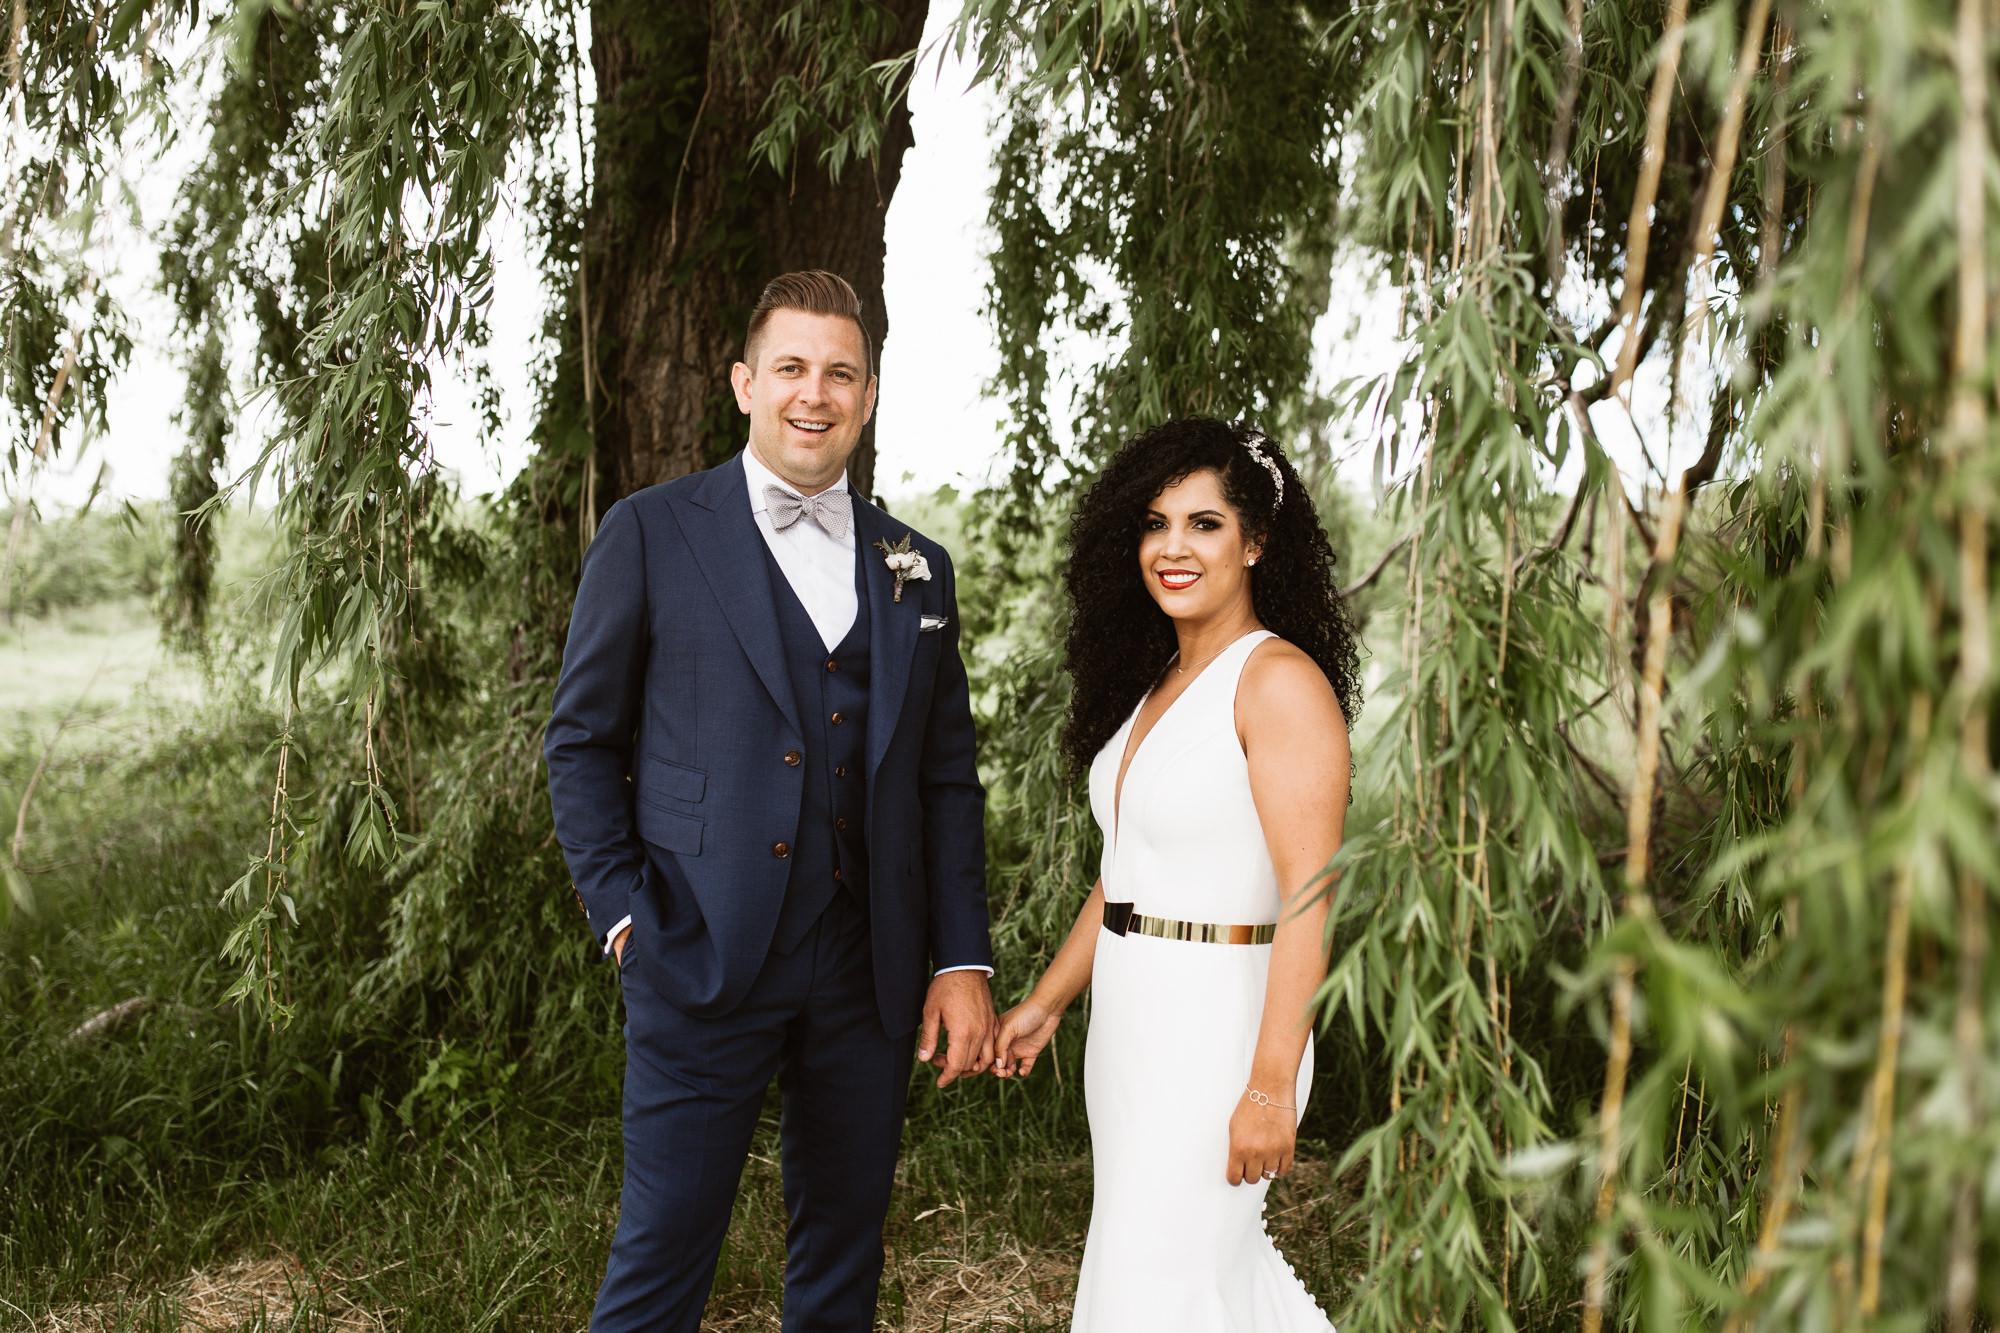 stratus-winery-wedding-vineyard-wedding-vineyard-bride-photo-by-reed-photography-030.jpg